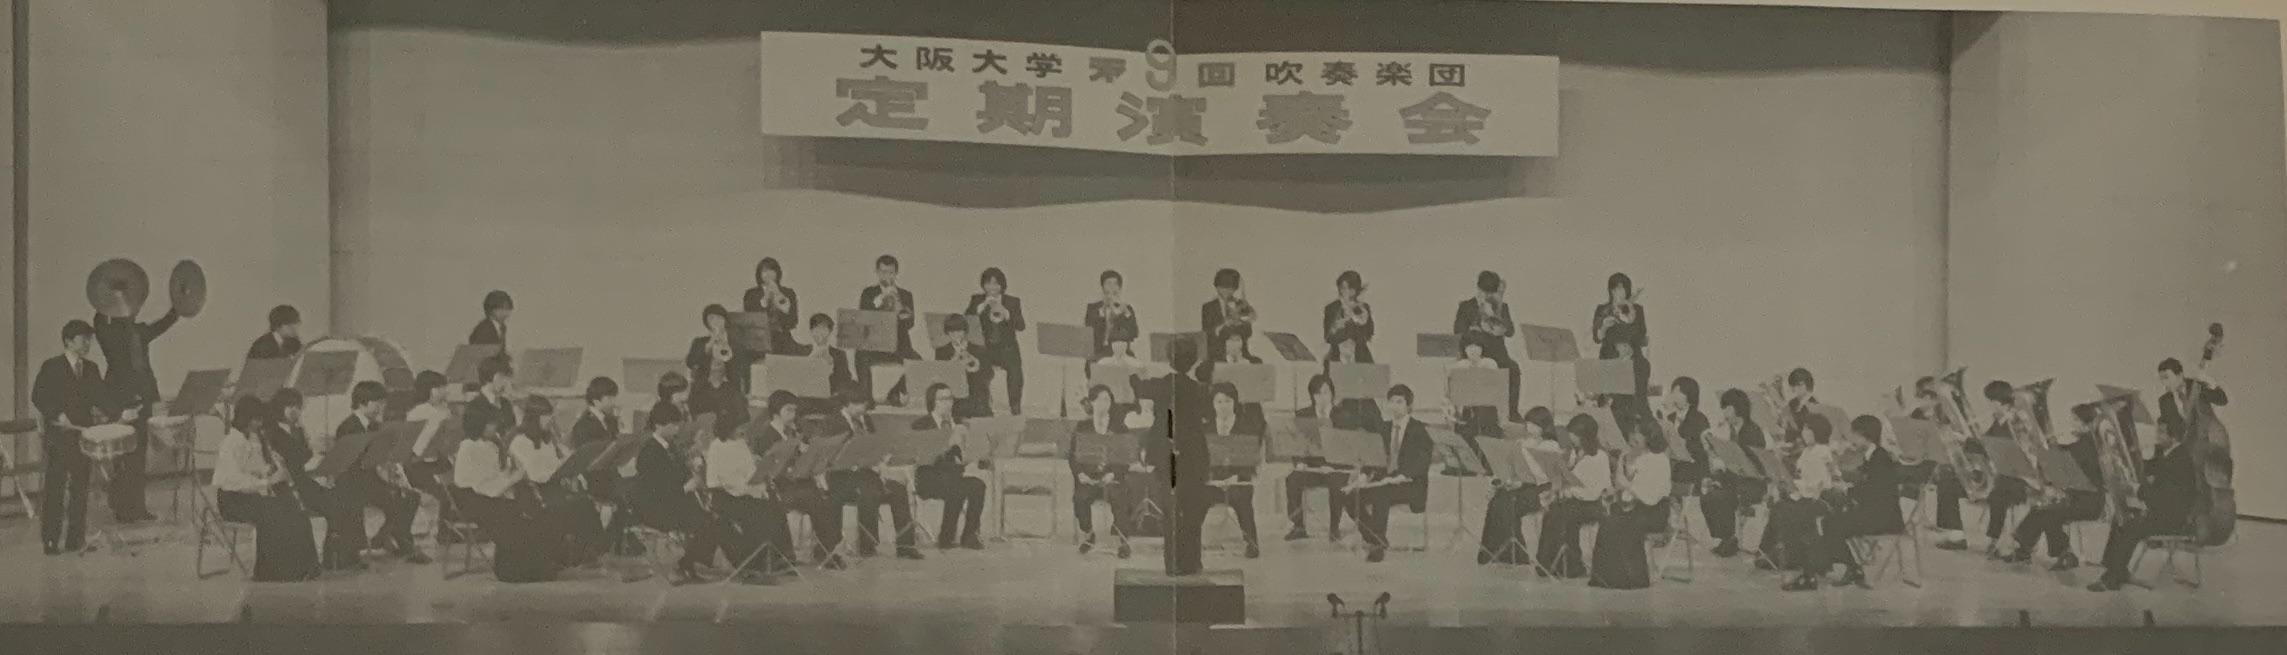 f:id:machikane2011:20190803224228j:image